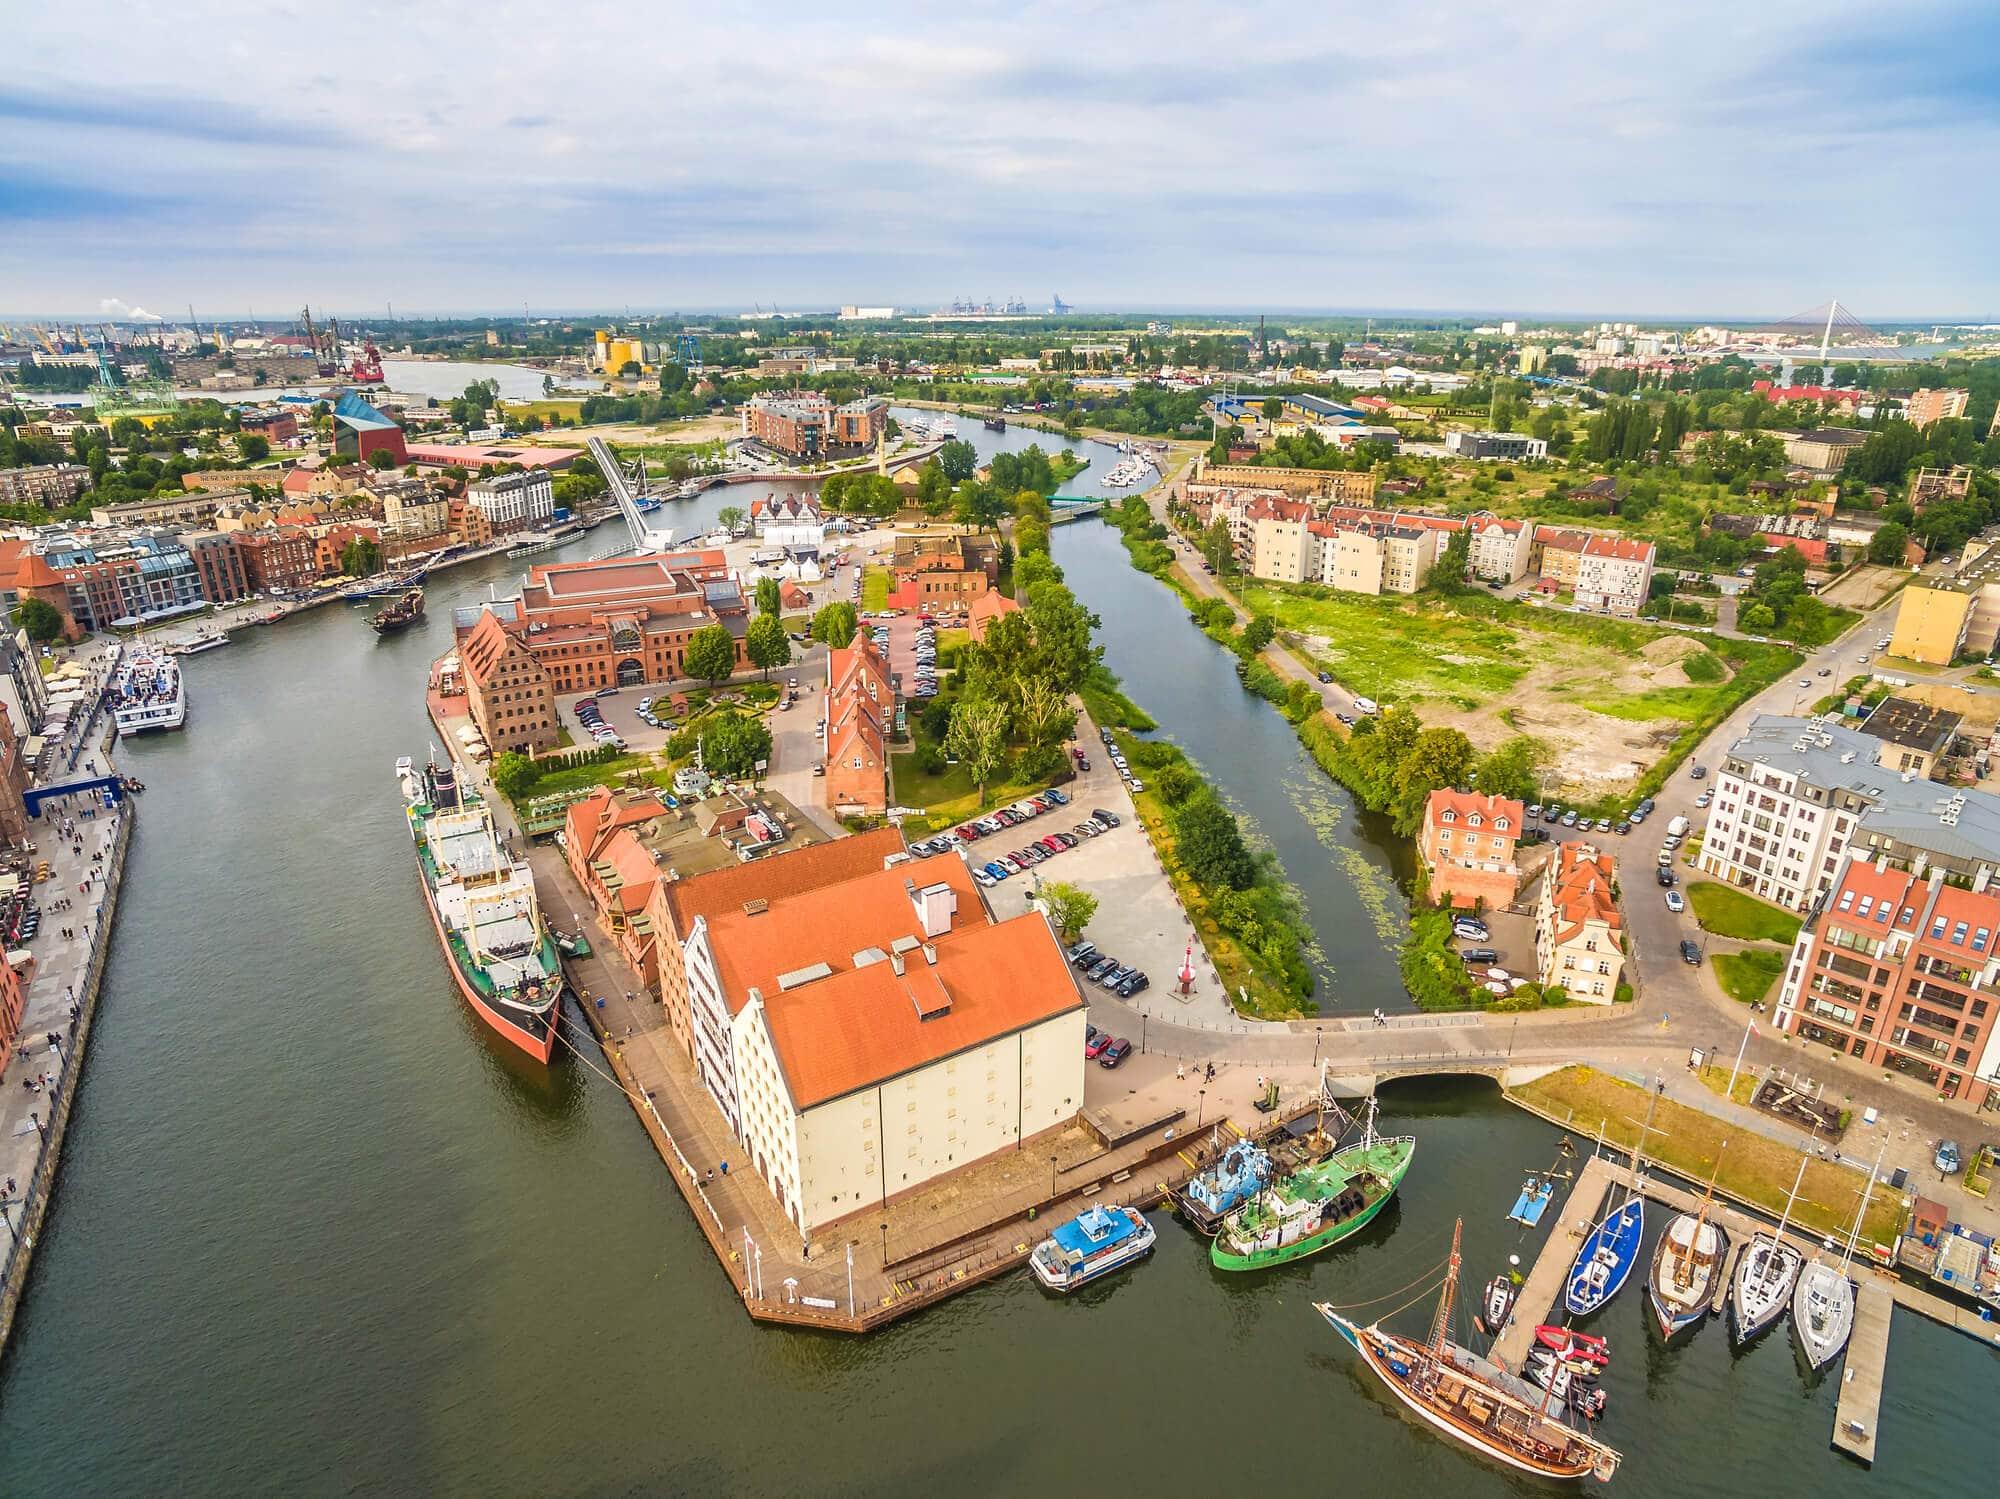 2 days in Gdansk, Poland - Aerial view of Olowianka Island